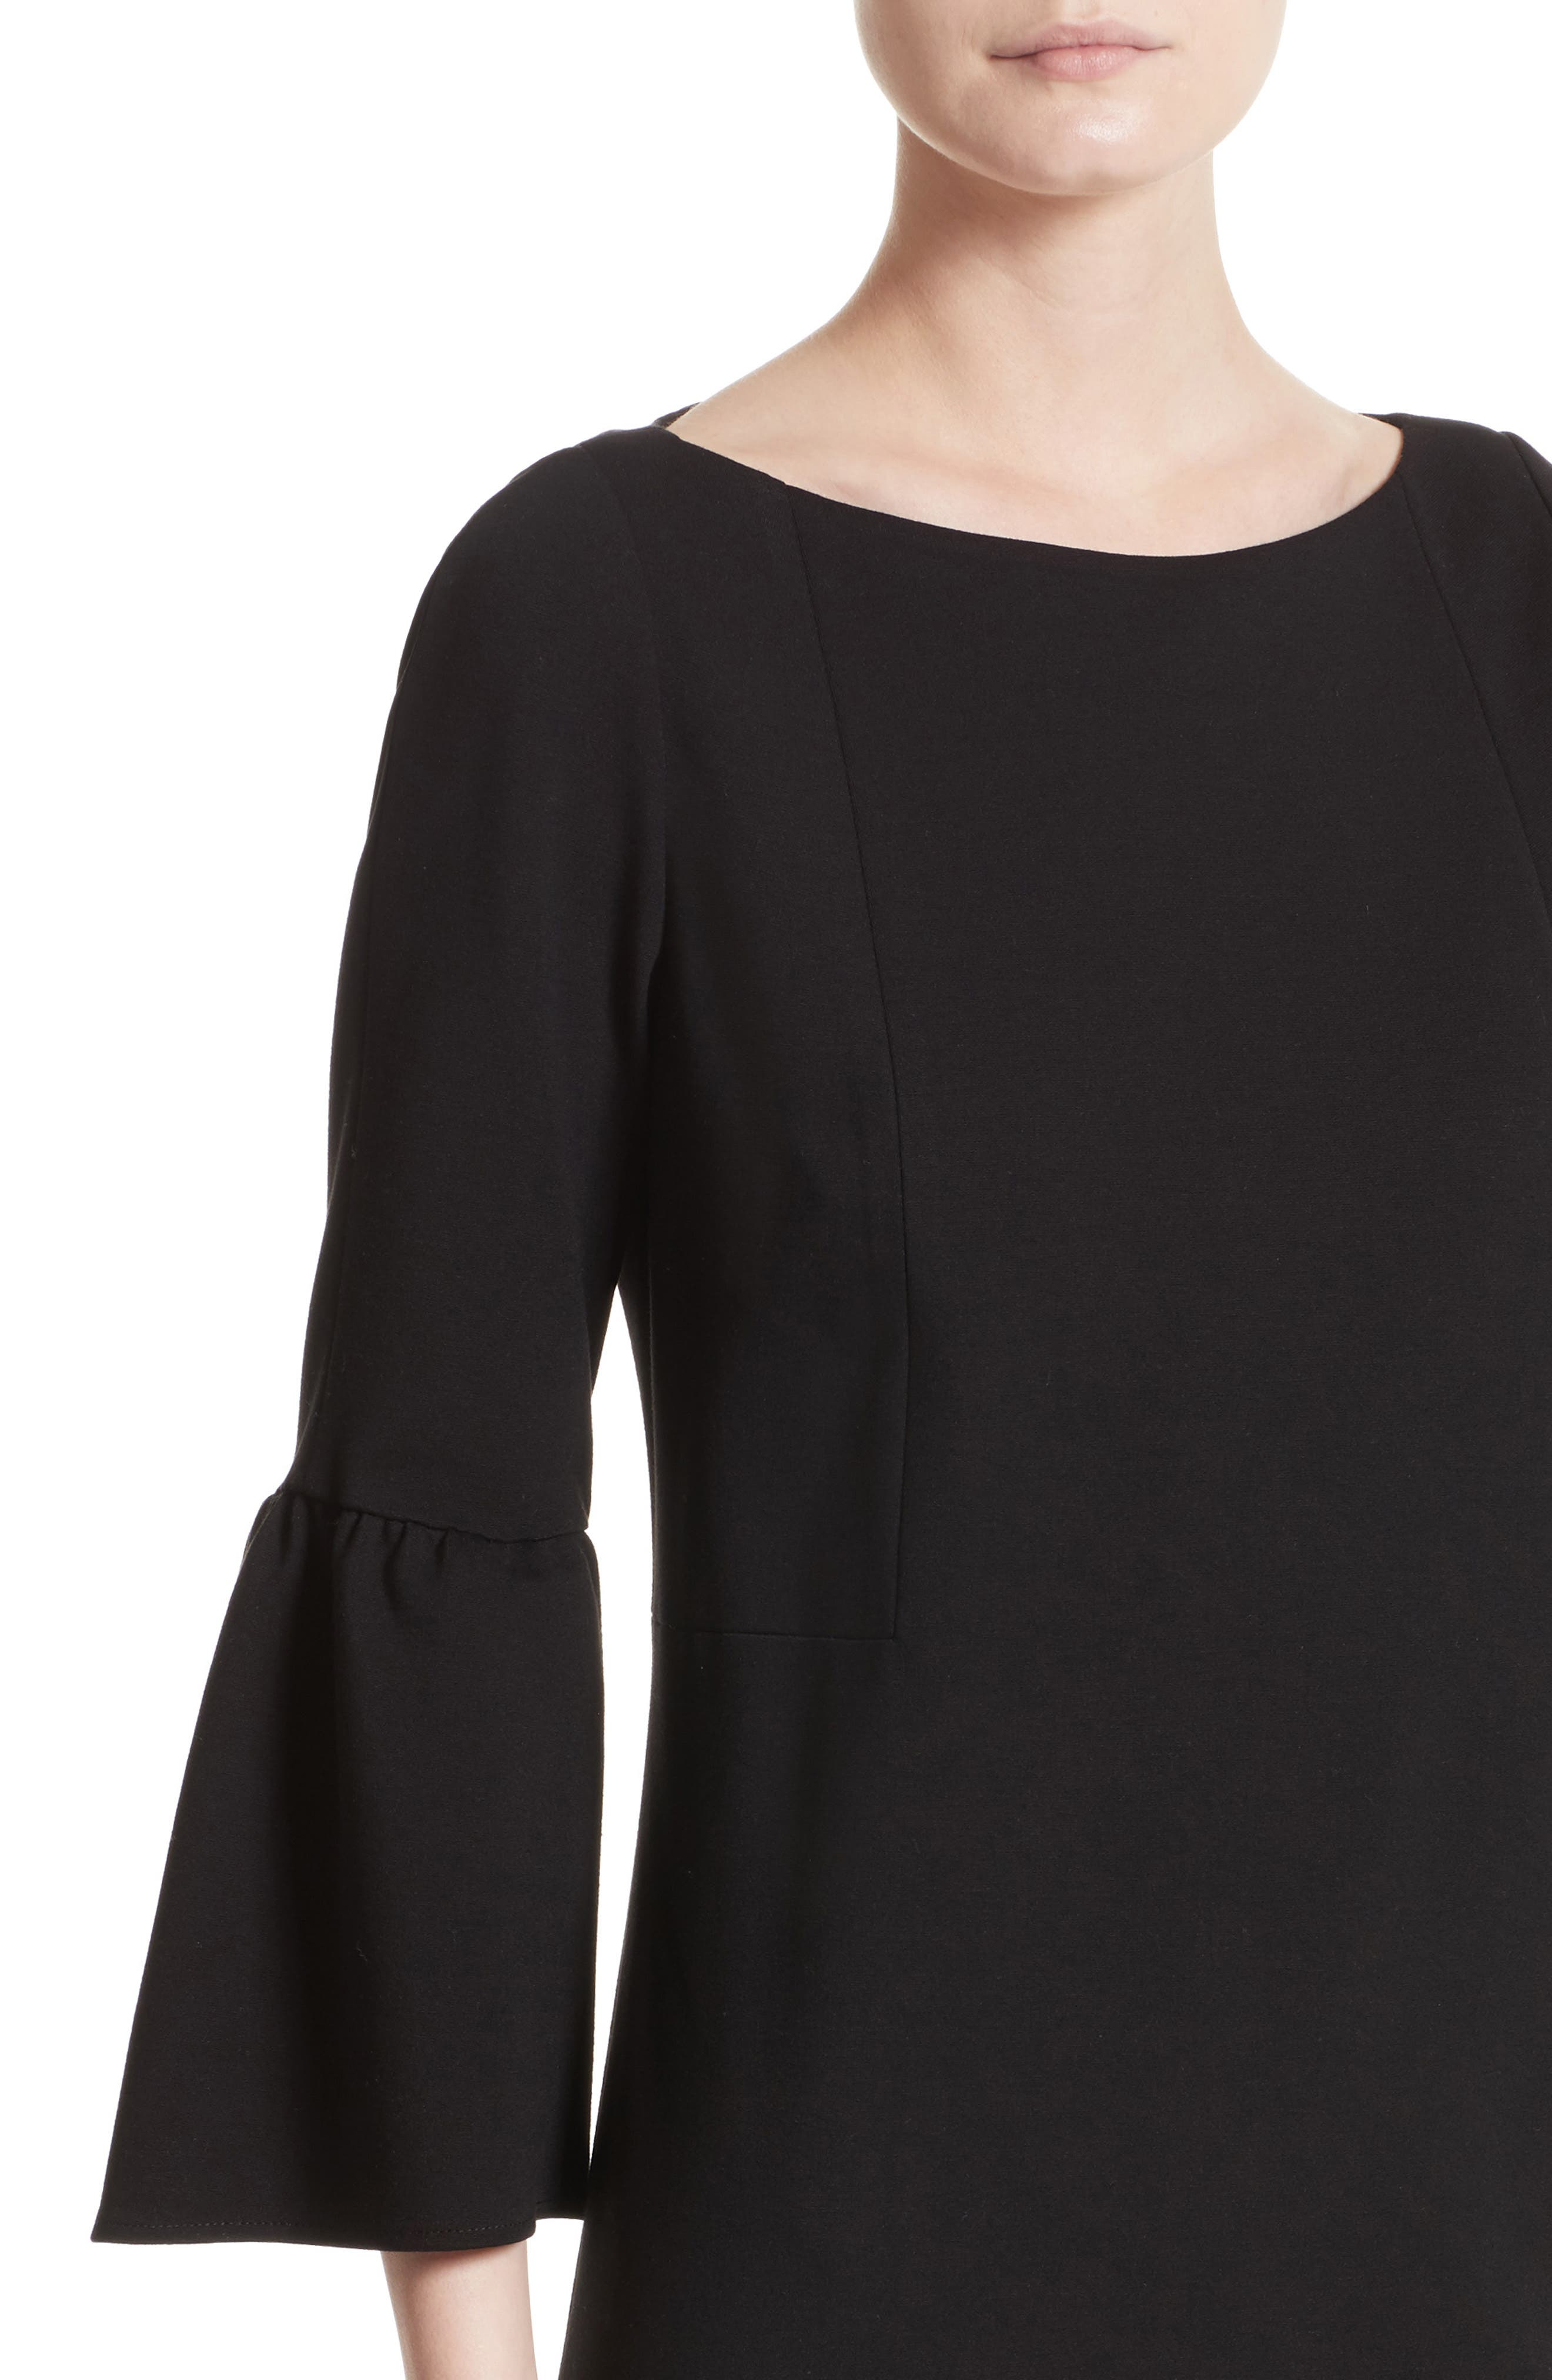 Marissa Punto Milano Dress,                             Alternate thumbnail 4, color,                             Black